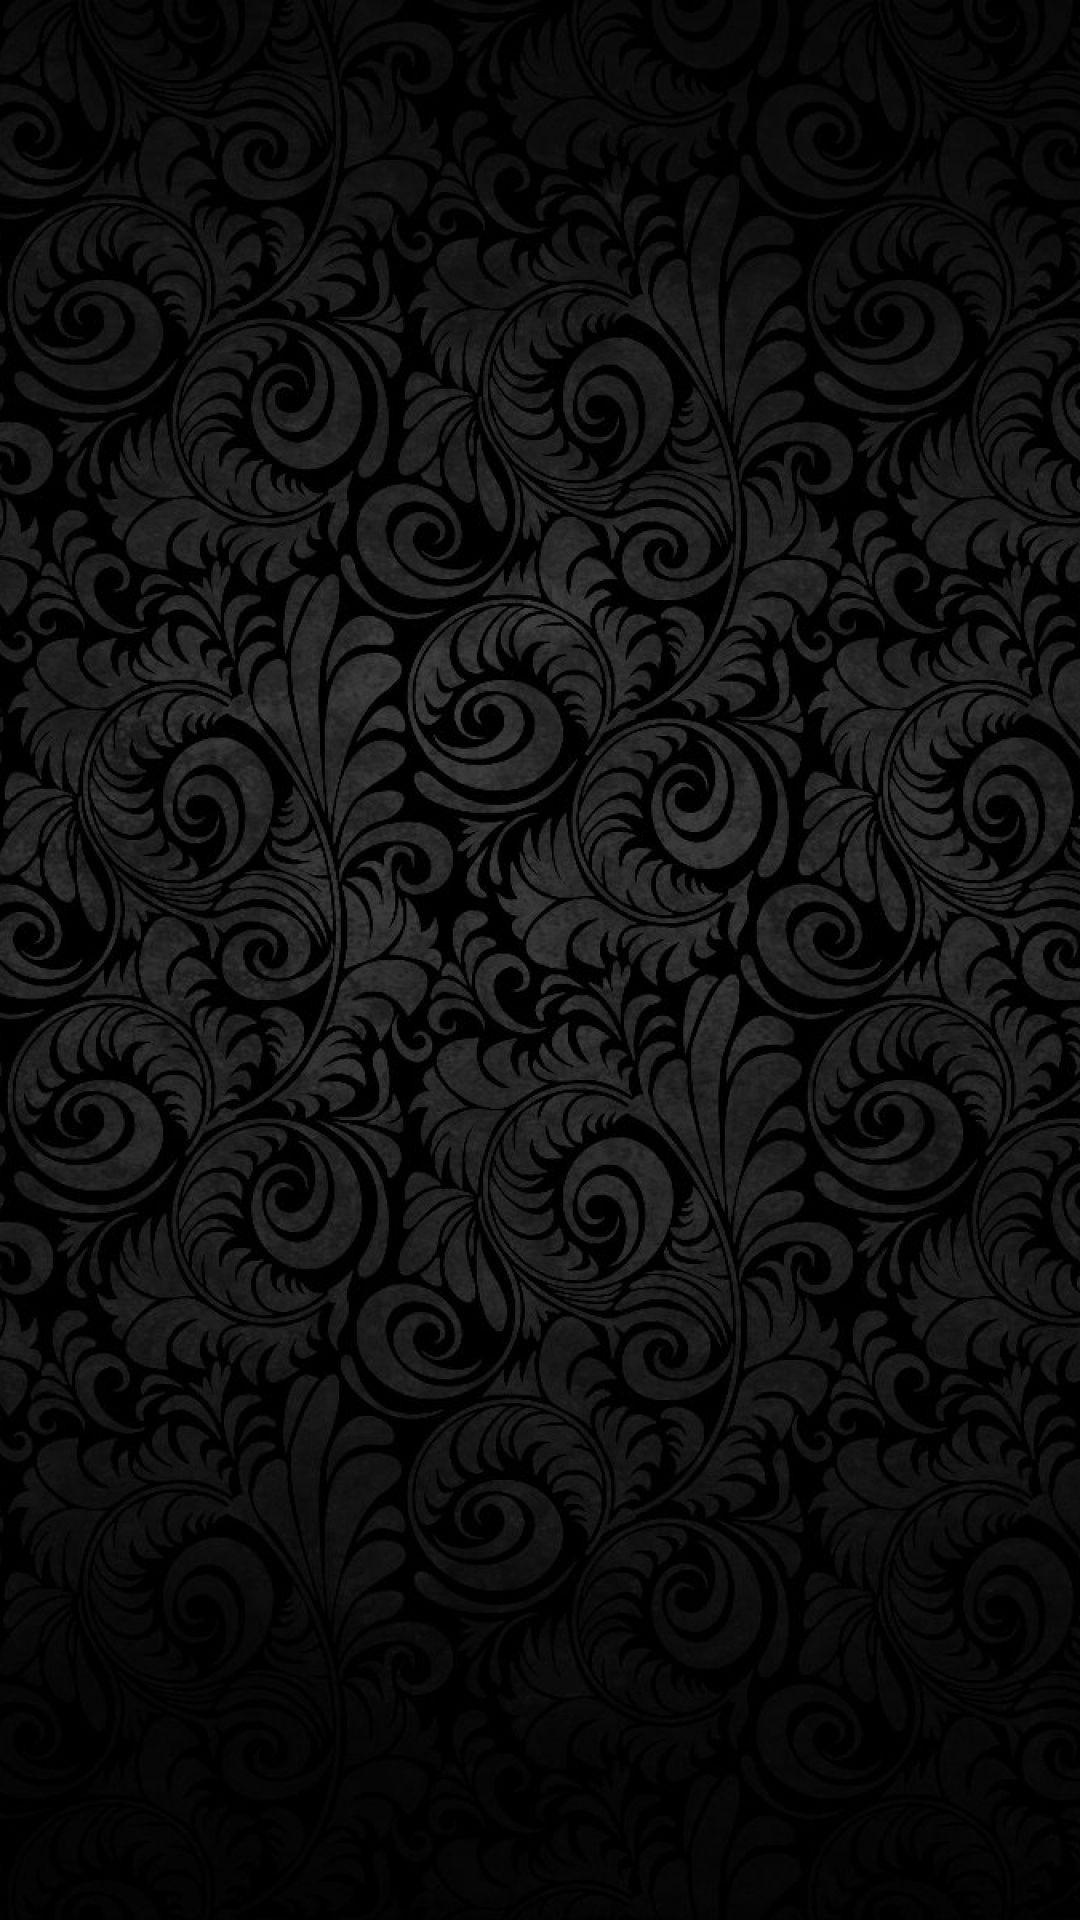 black wallpaper iphone hd download wallpaper pinterest. Black Bedroom Furniture Sets. Home Design Ideas